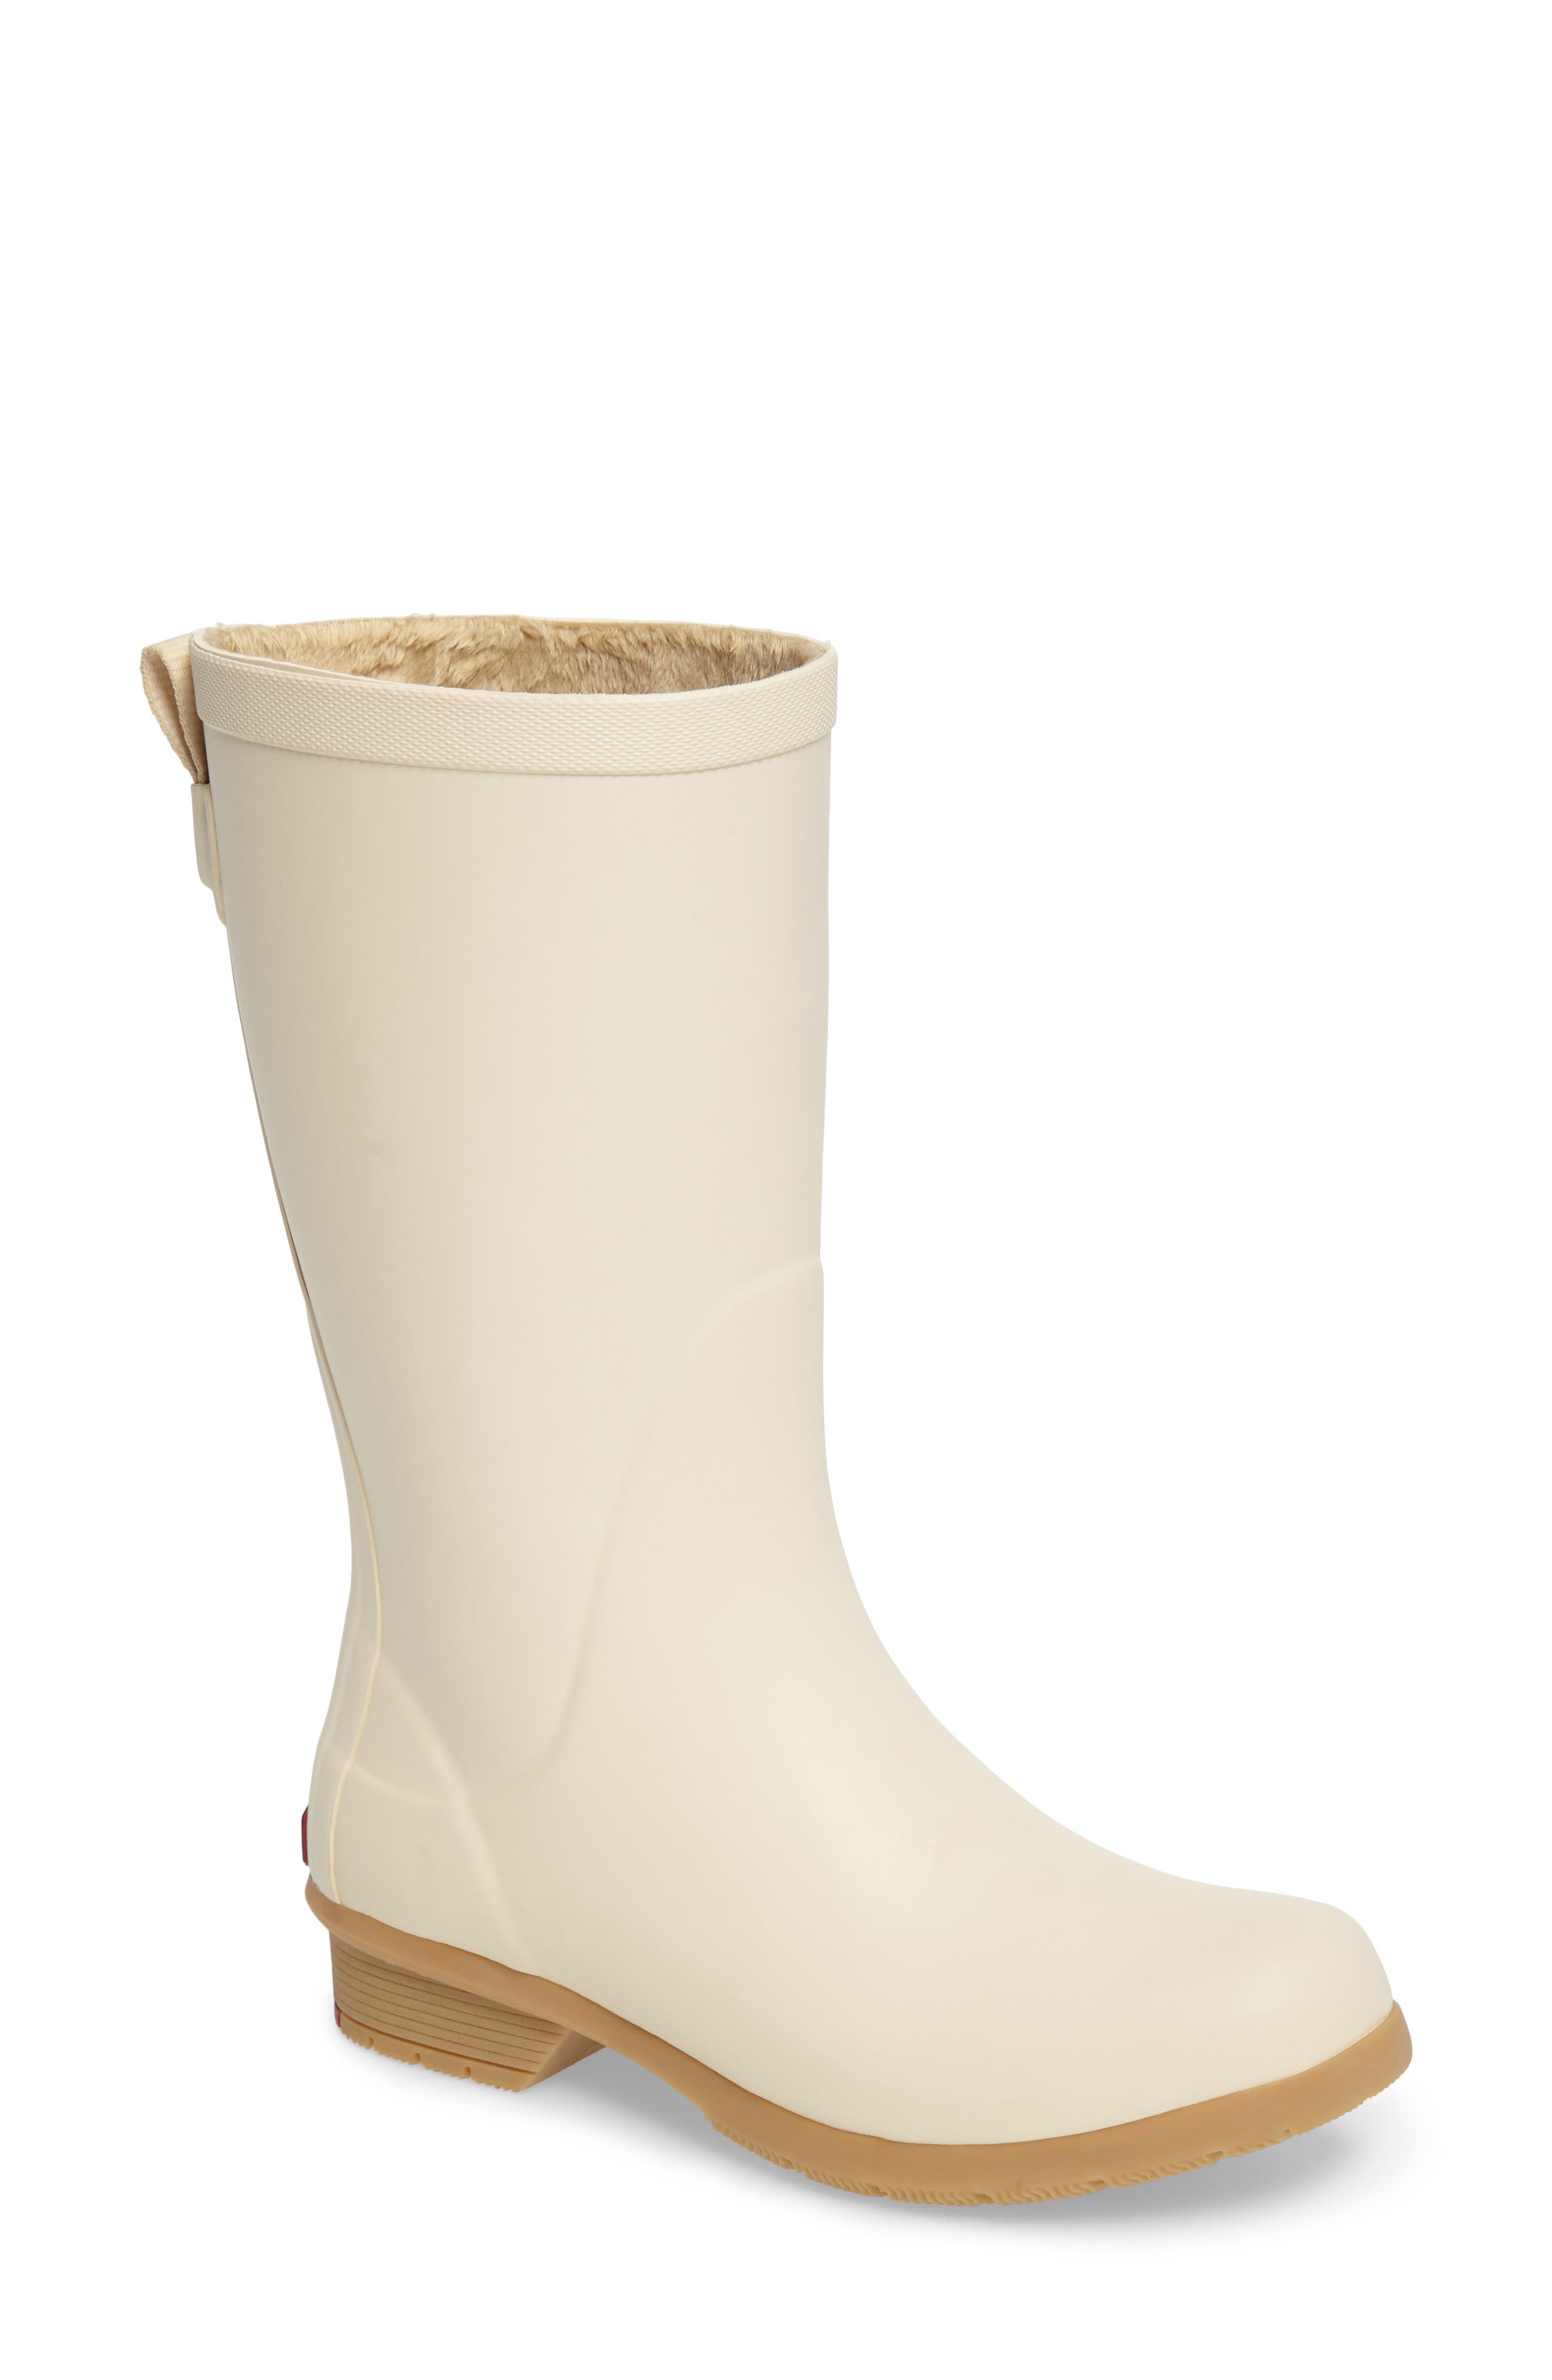 Main Image - Chooka Bainbridge Rain Boot (Women)